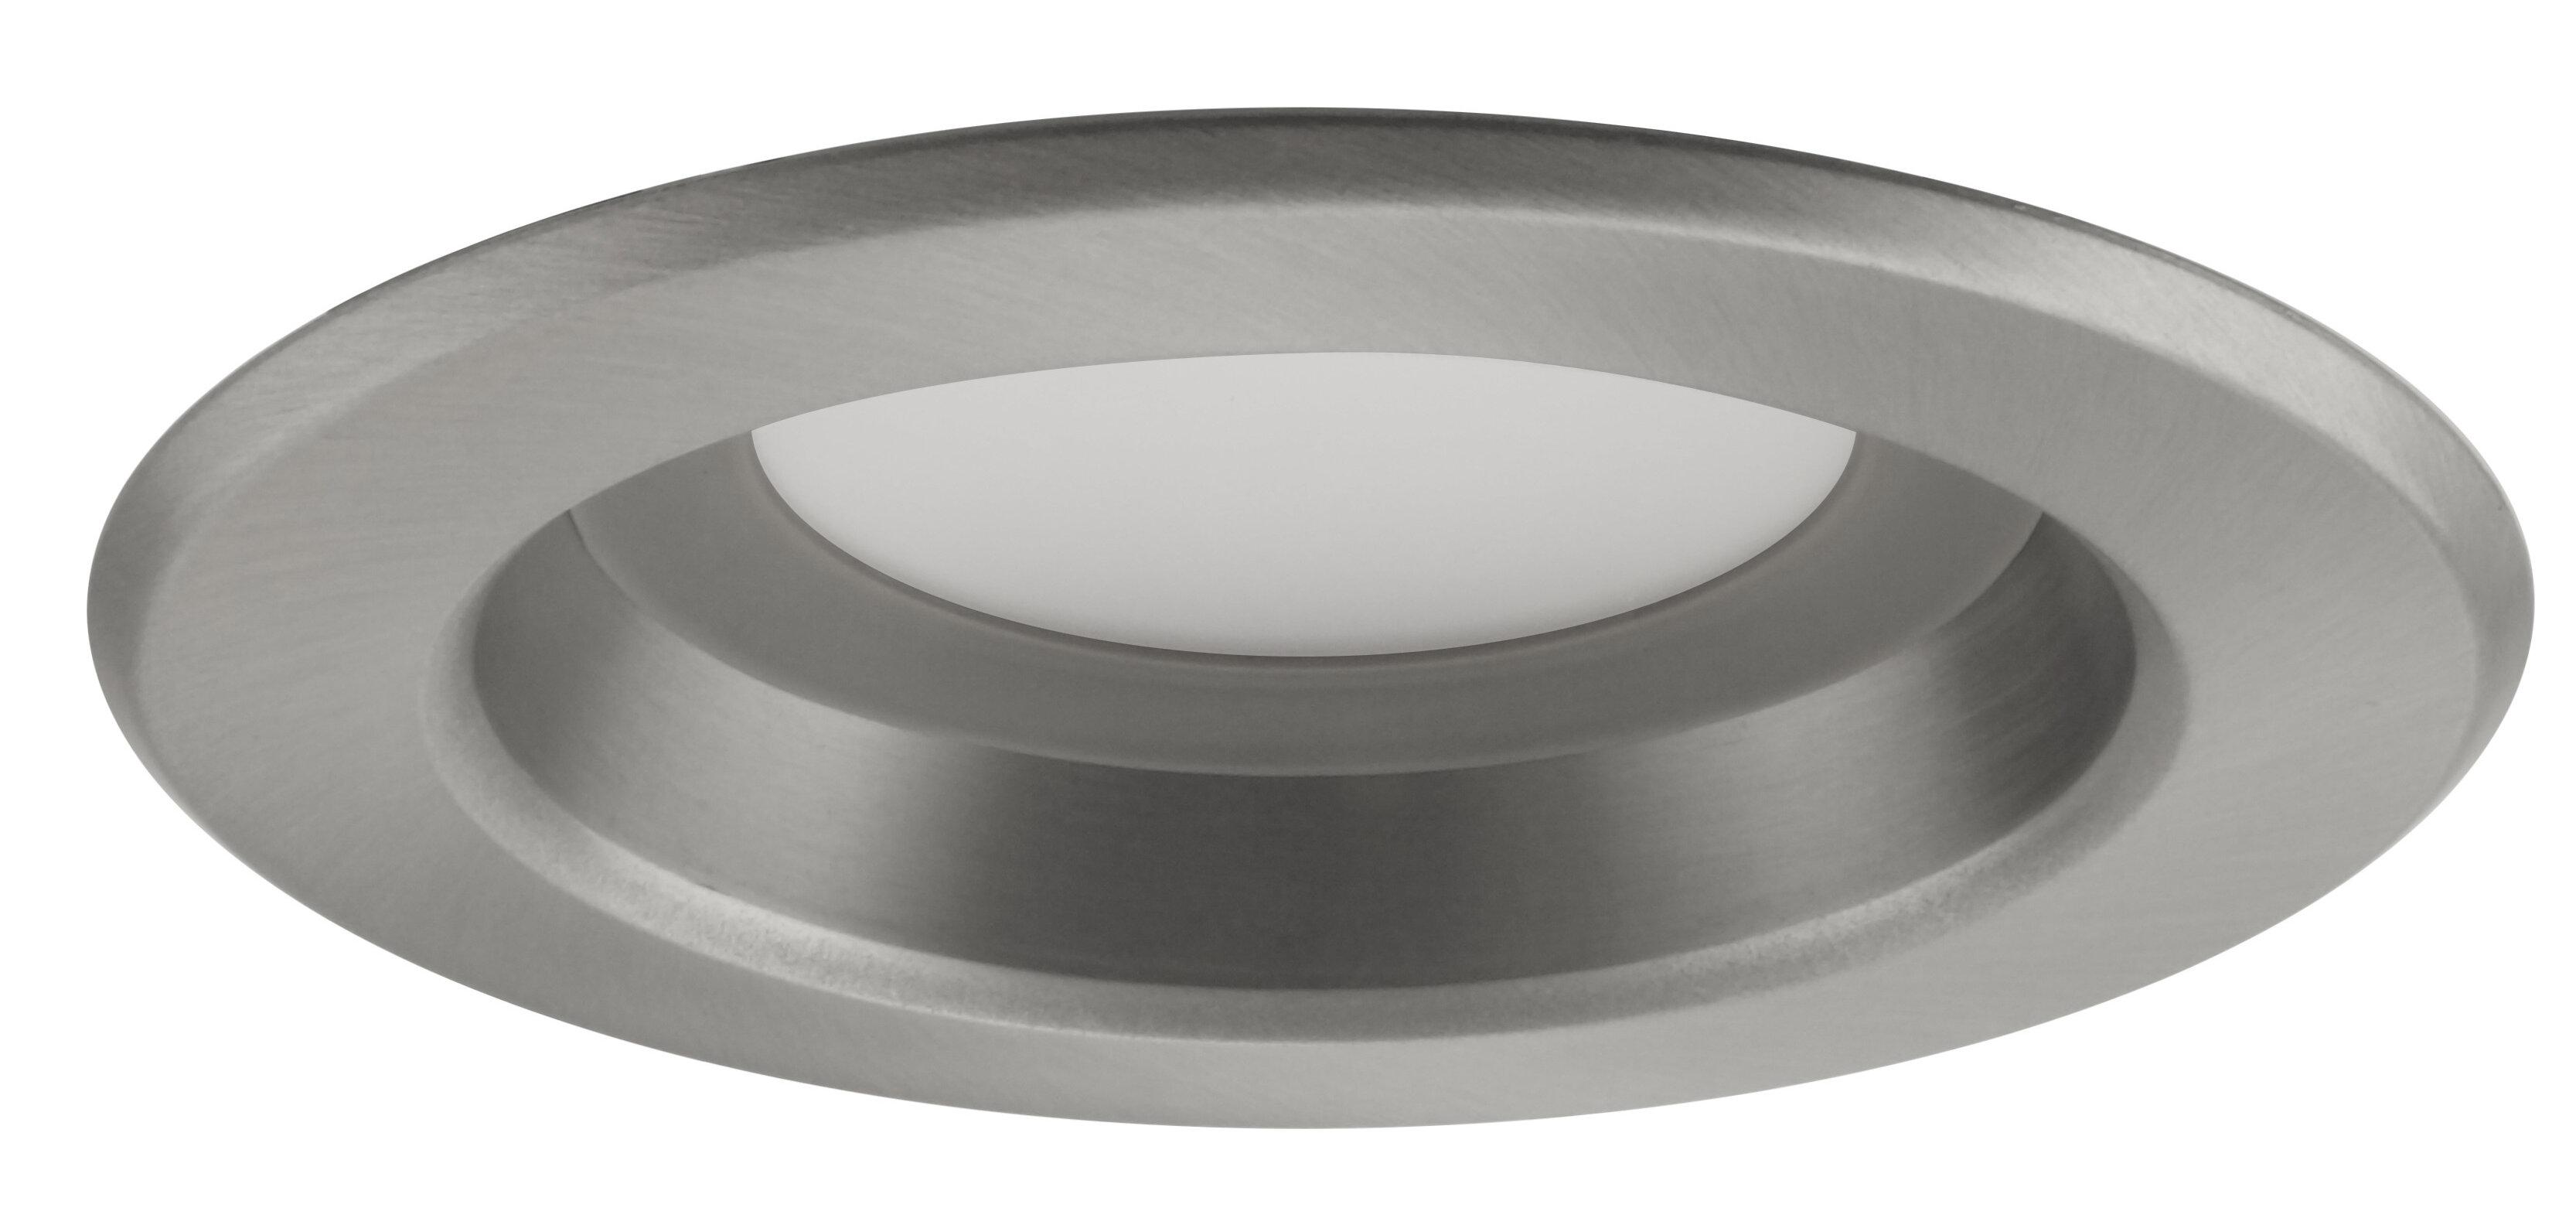 nicor lighting baffle 4 led recessed retrofit downlight reviews